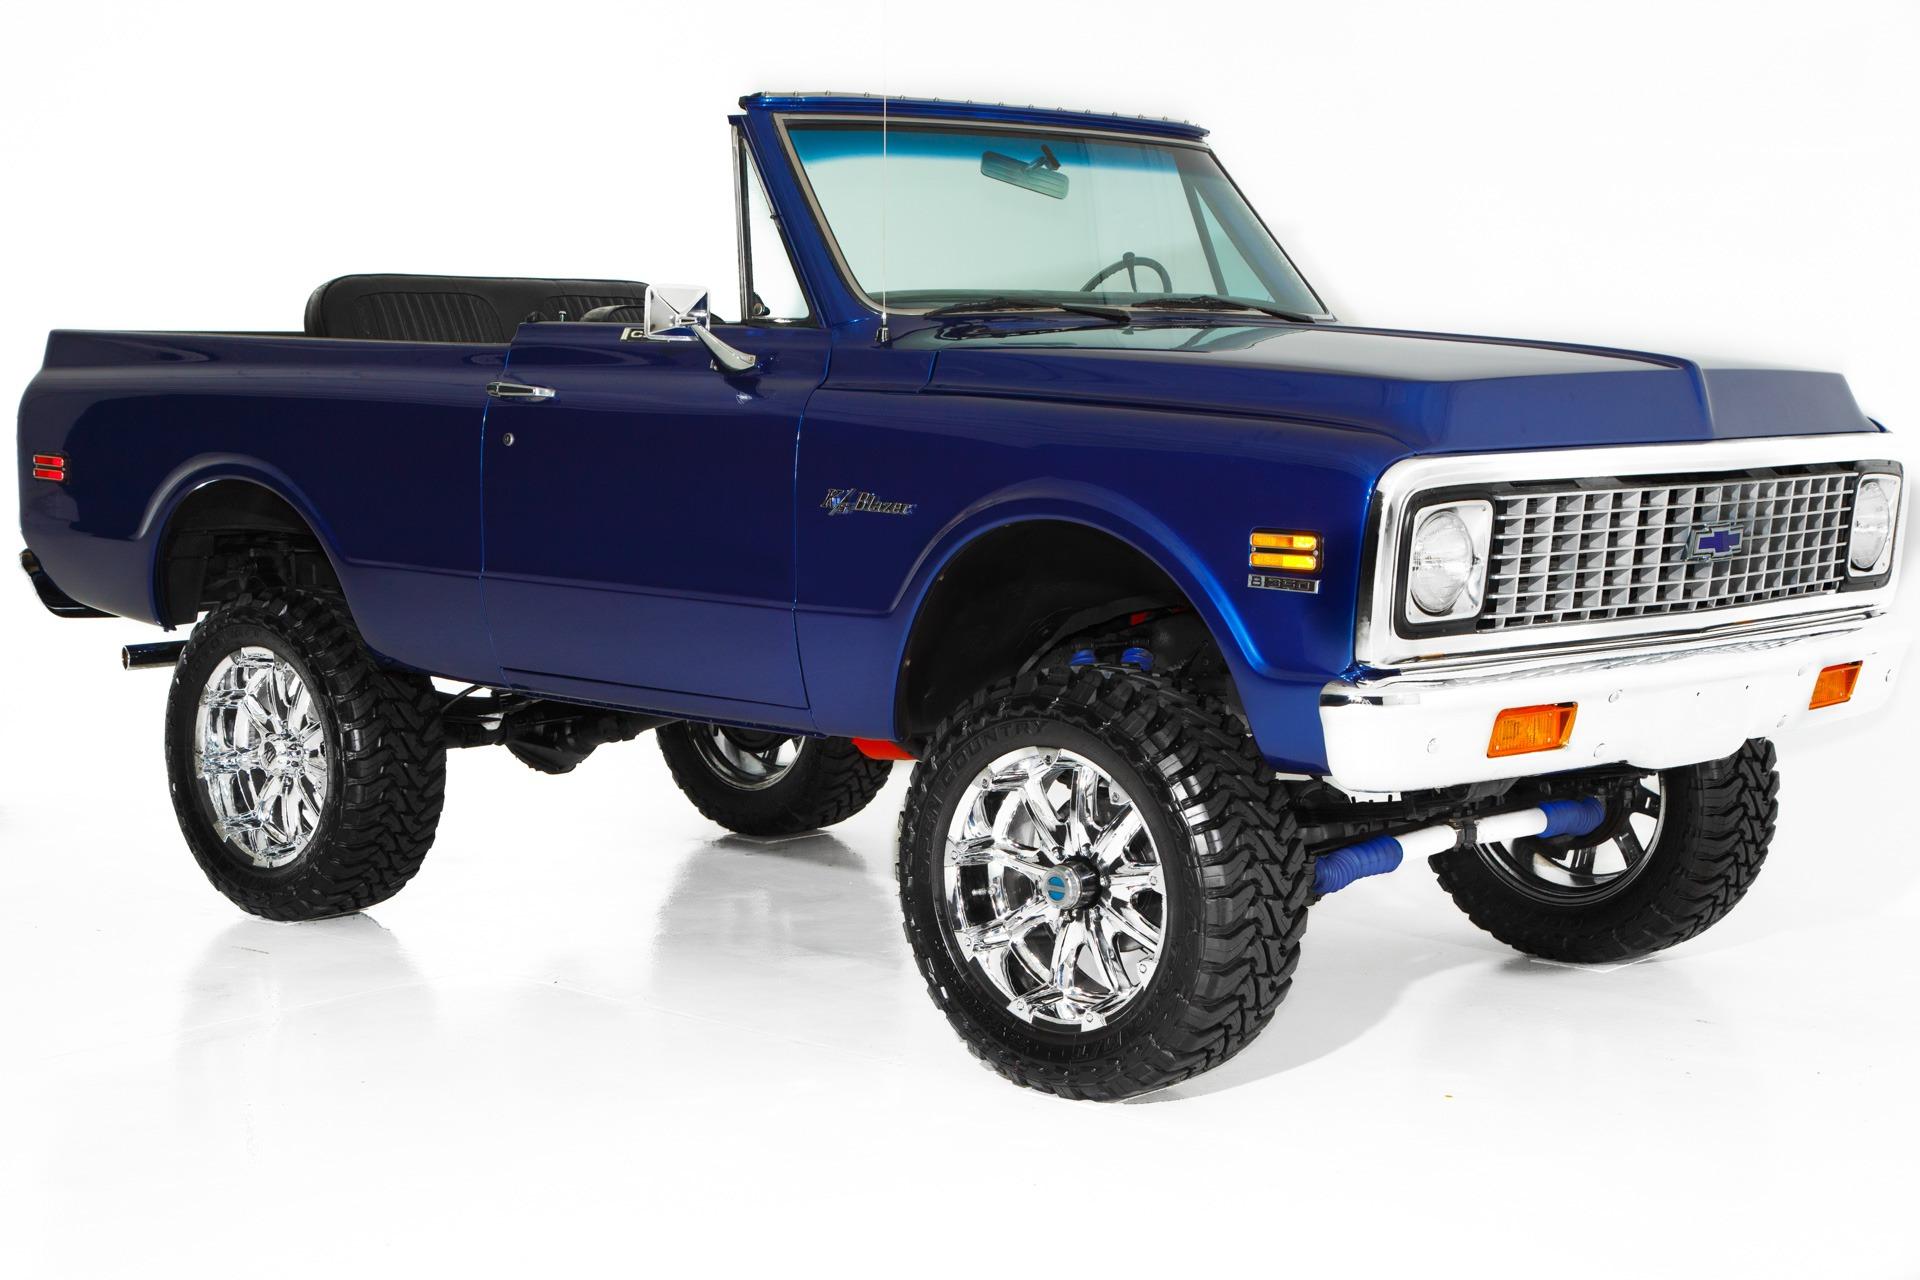 Photo 1972 Chevrolet Blazer Blue Metallic, 383, Soft top